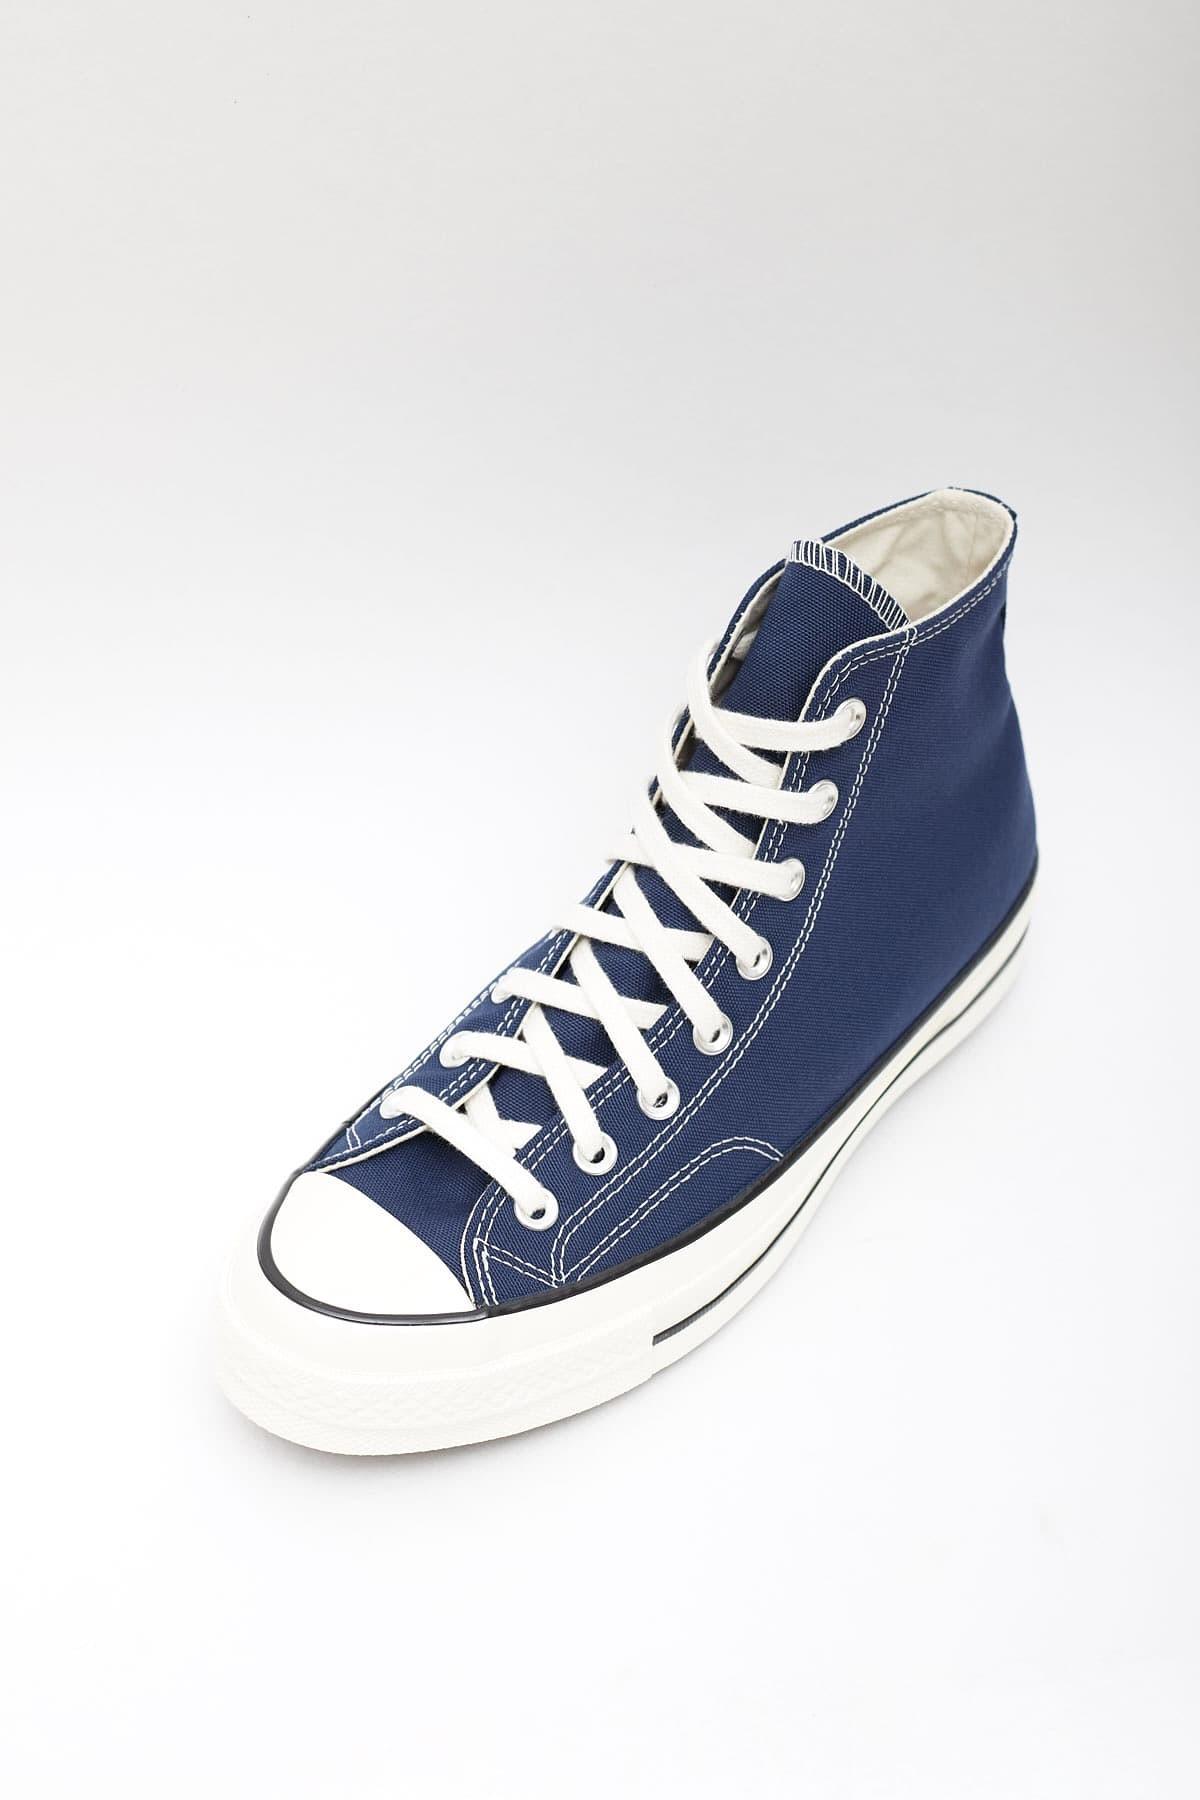 Comprar Adidas Continental 80 Off White EG6719